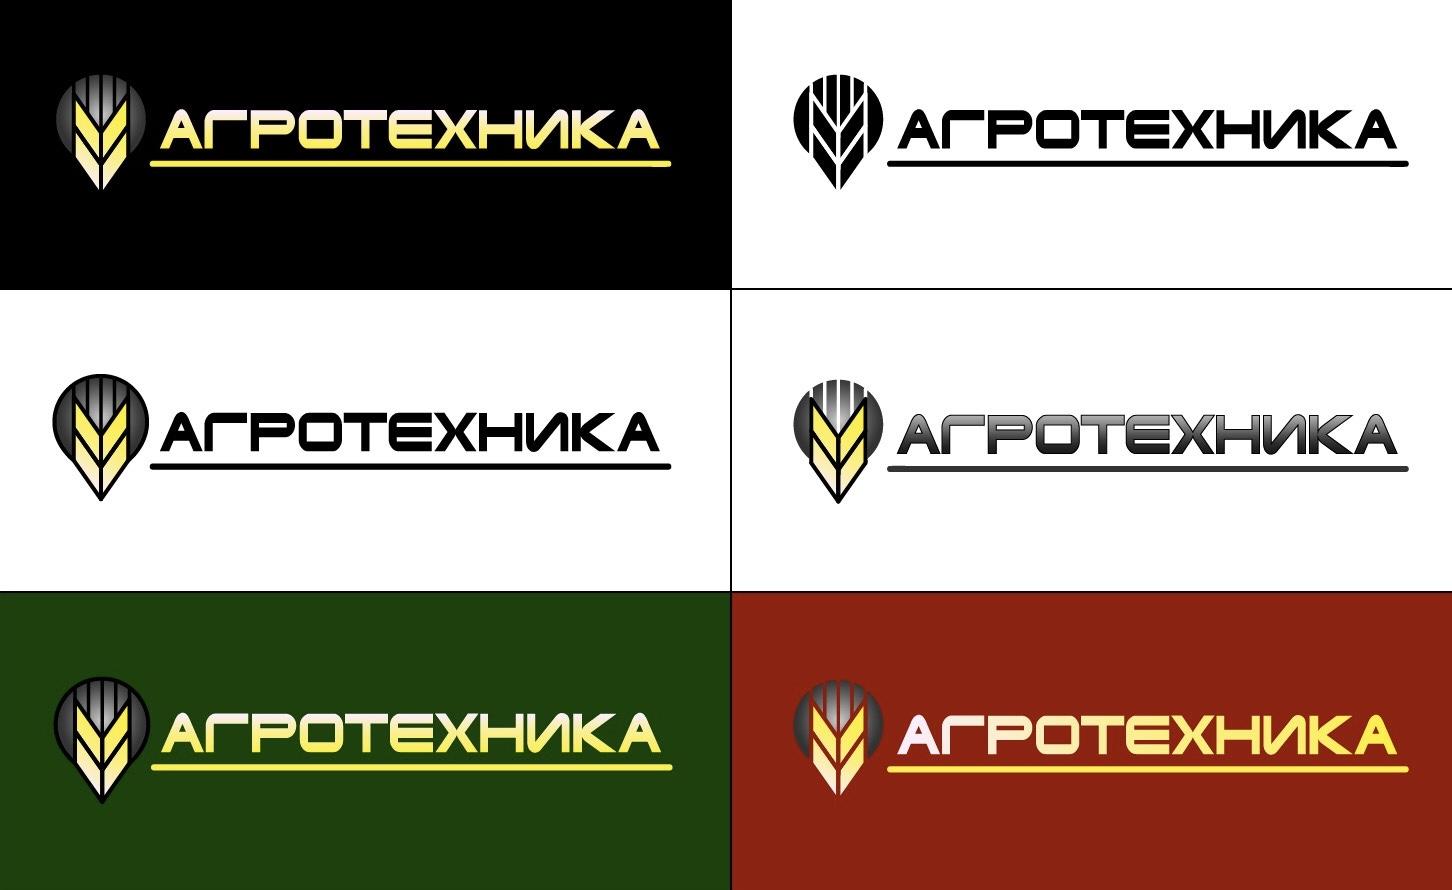 Разработка логотипа для компании Агротехника фото f_2375c083903e1c95.jpg